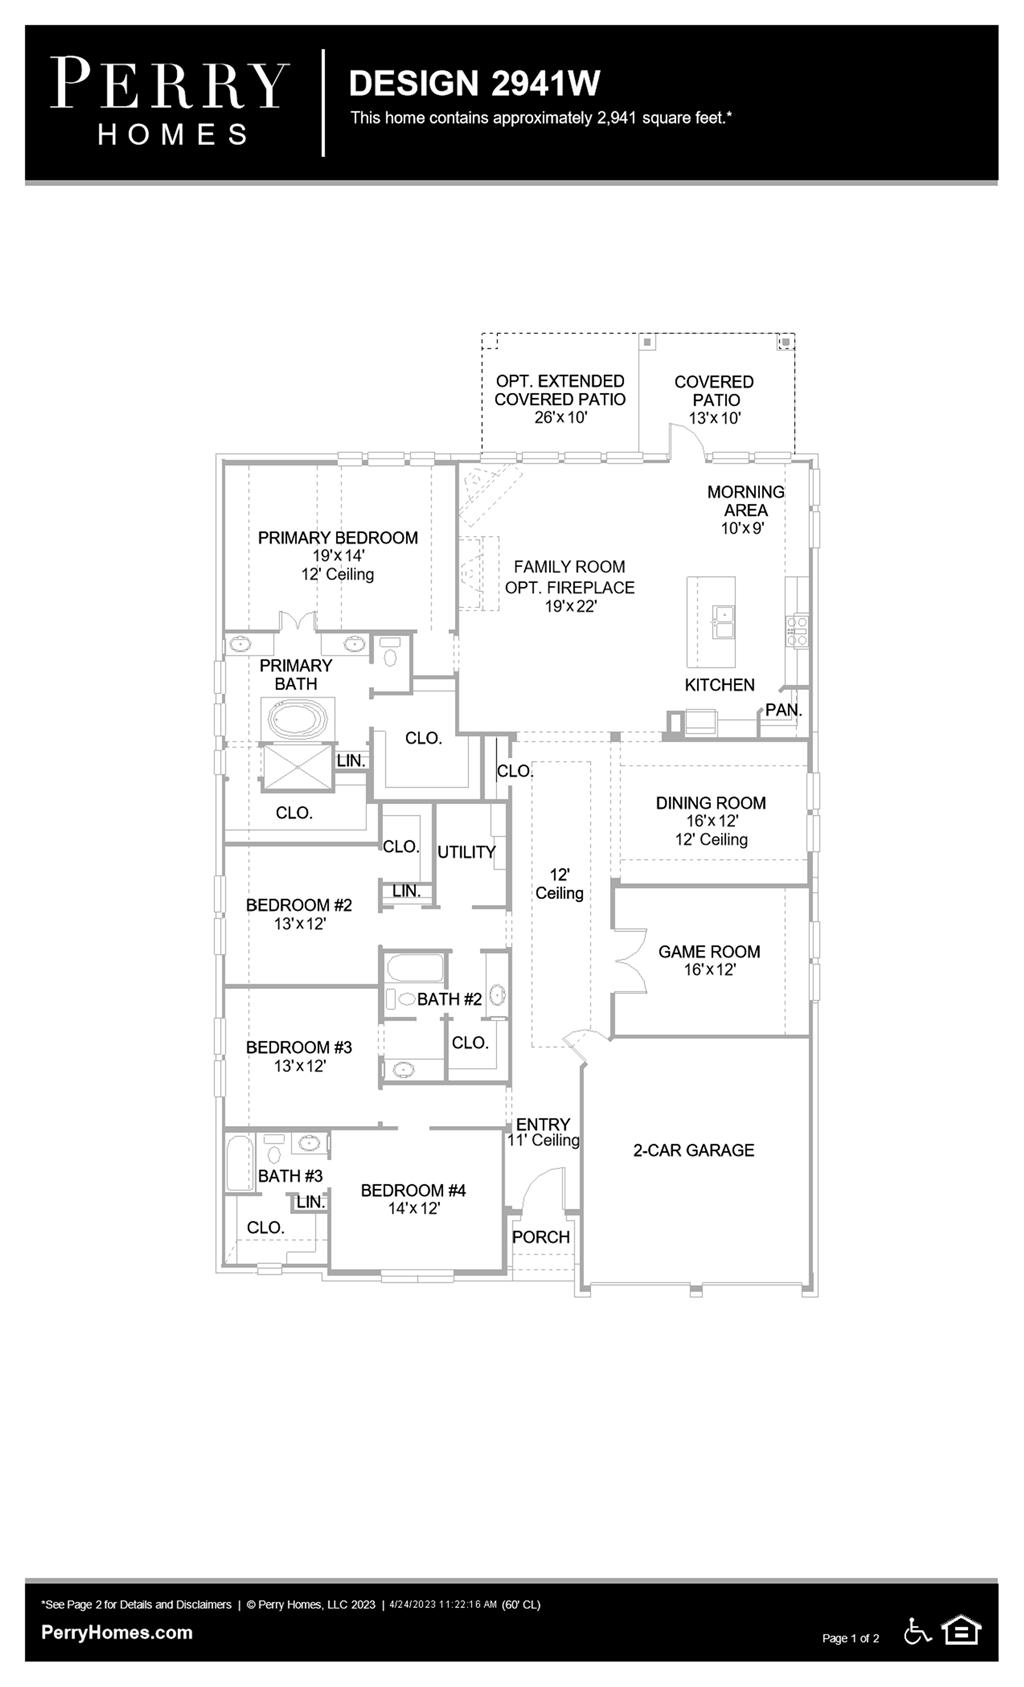 Floor Plan for 2941W